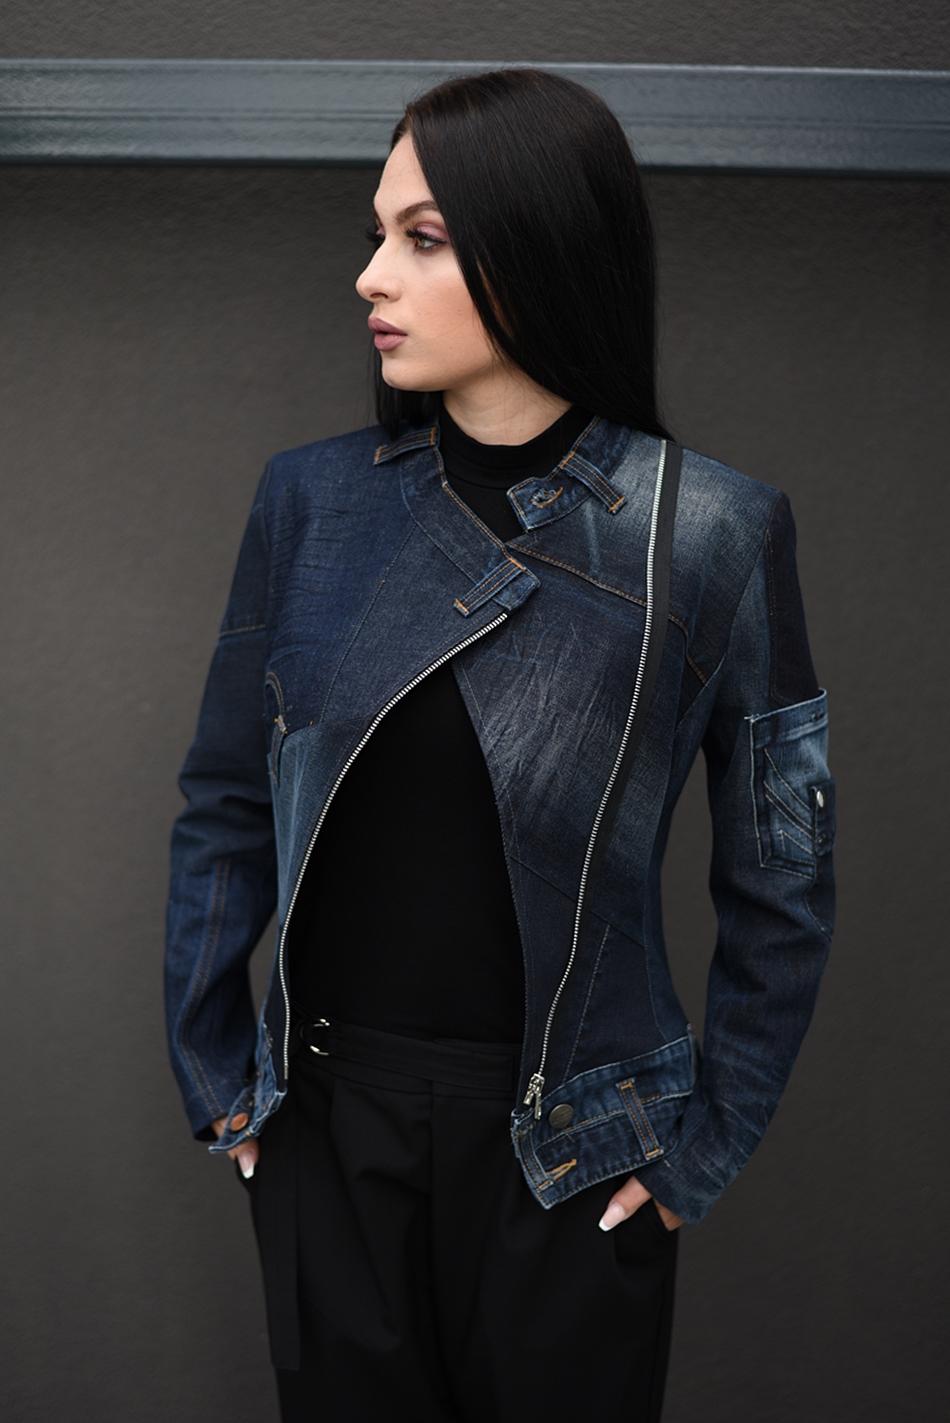 Broth_design_clothes_044